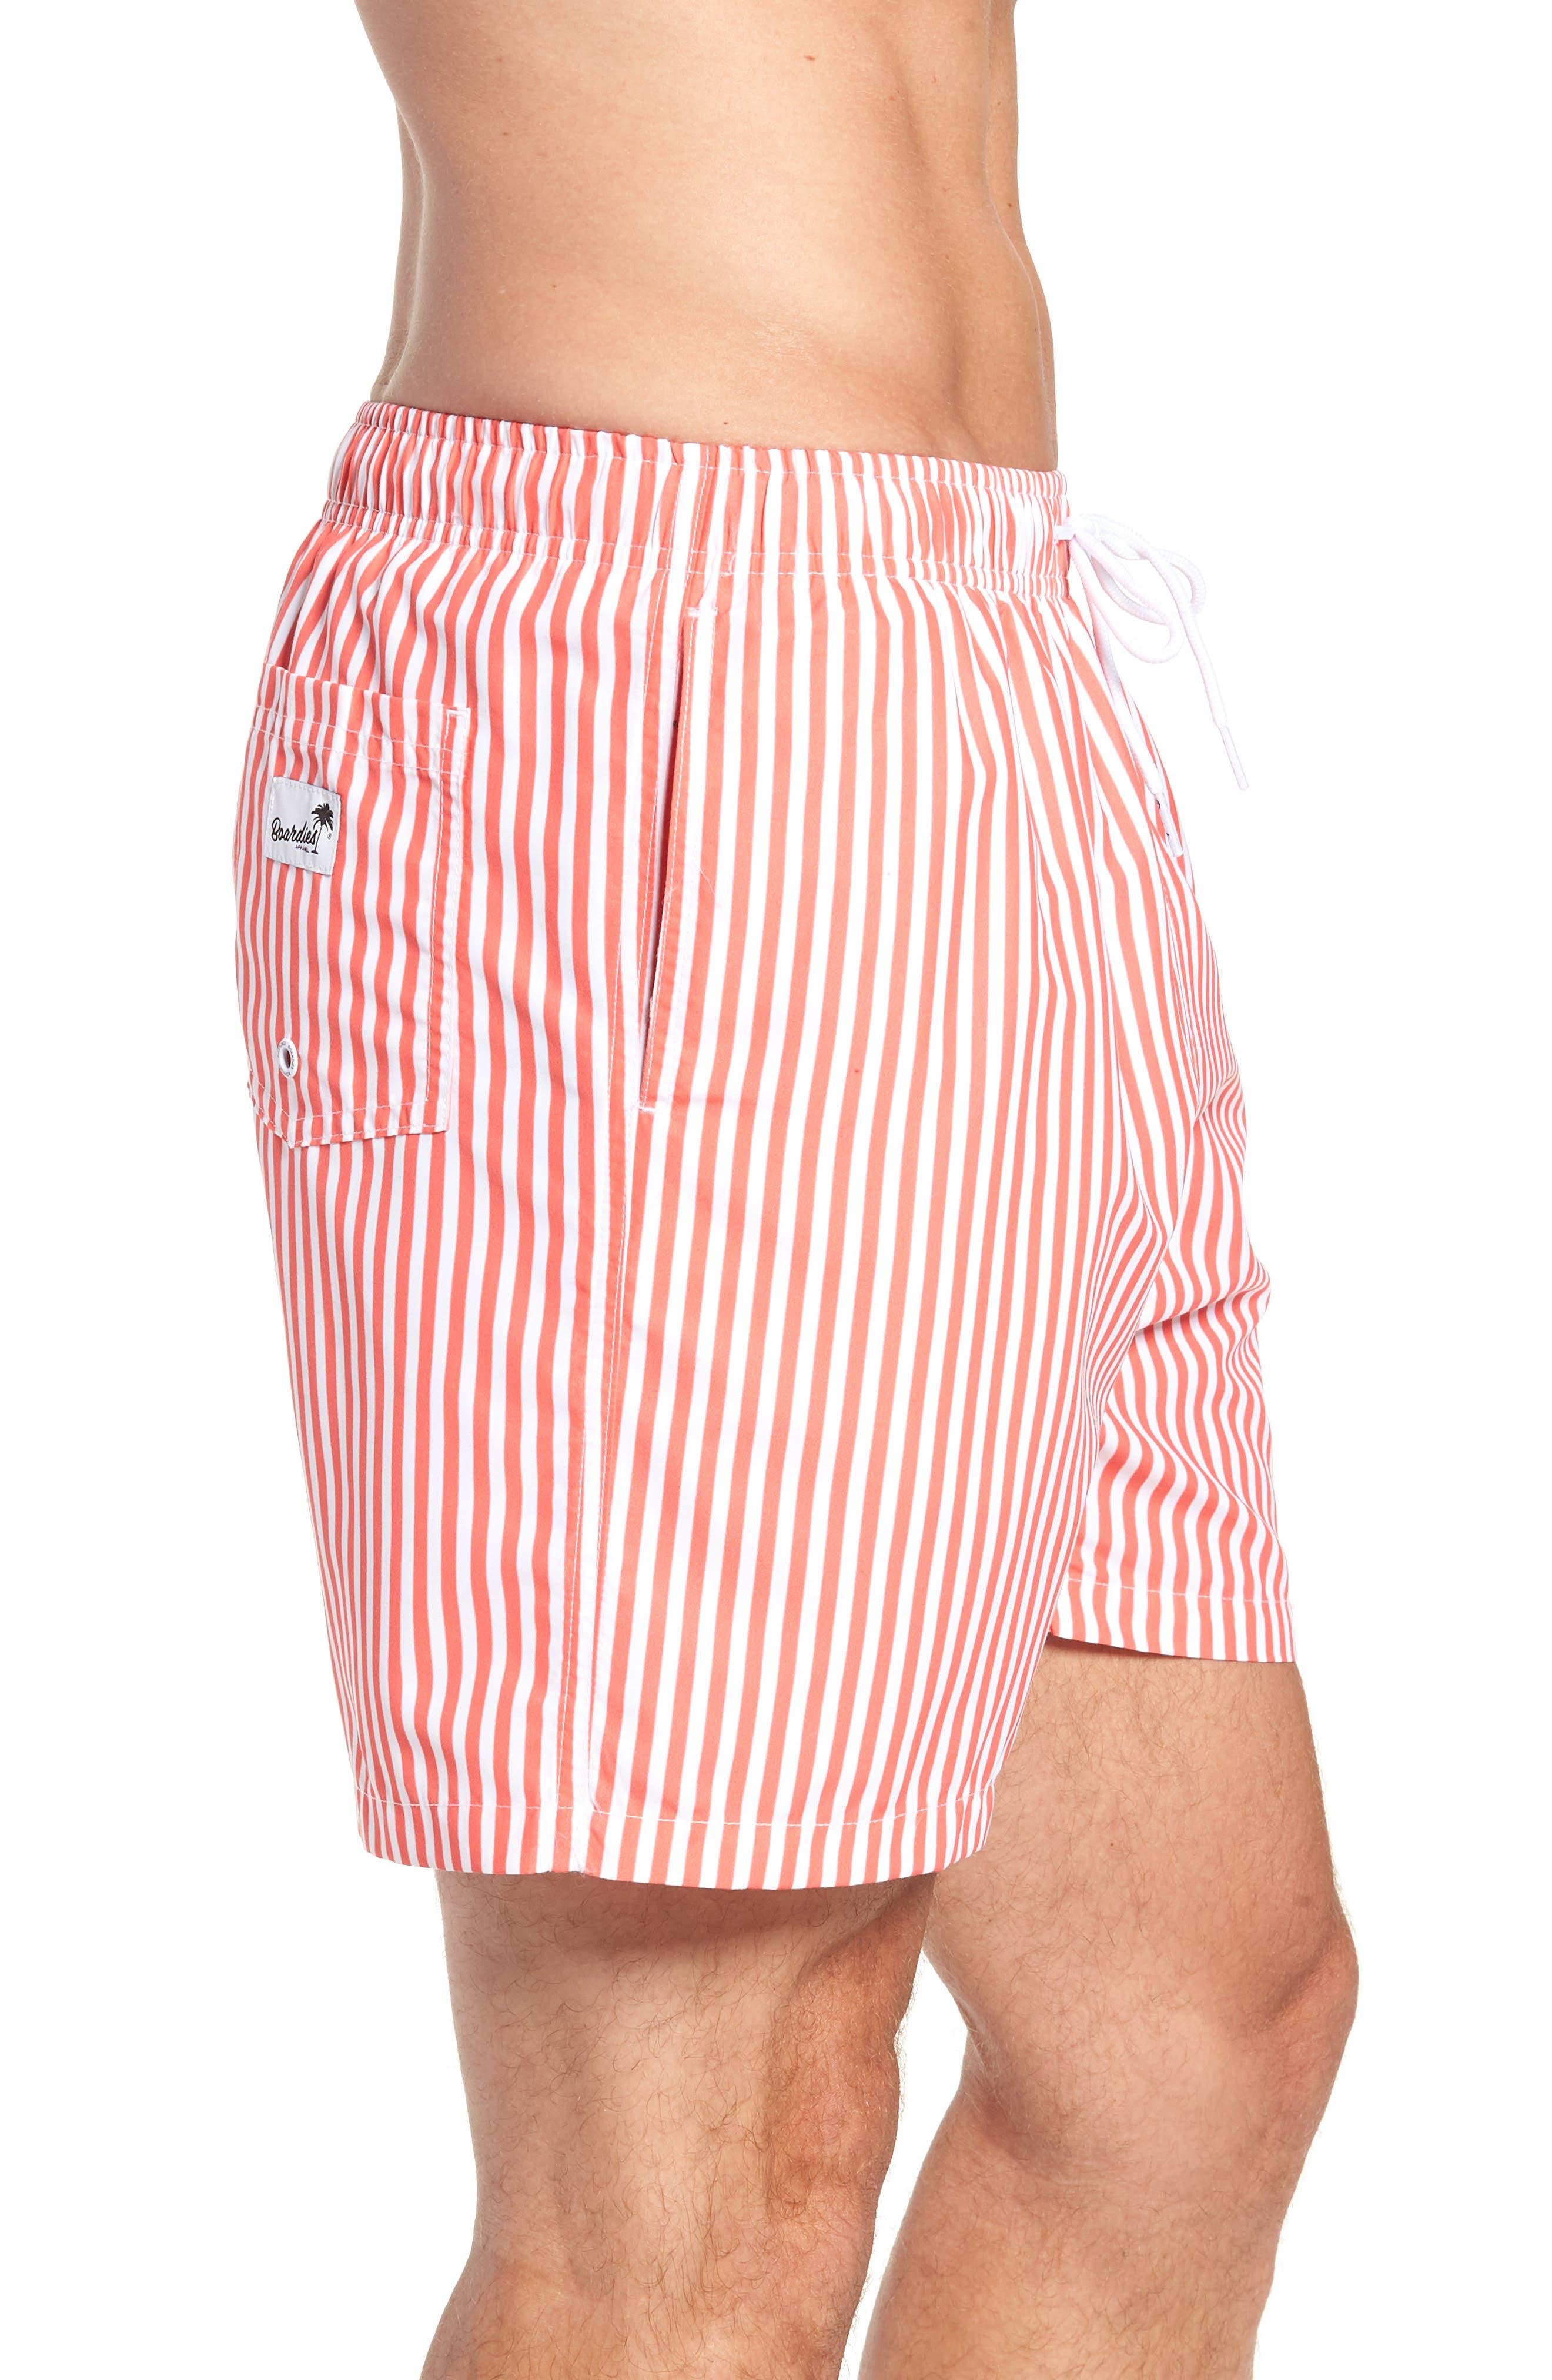 Deck Stripes Swim Trunks,                             Alternate thumbnail 3, color,                             PINK